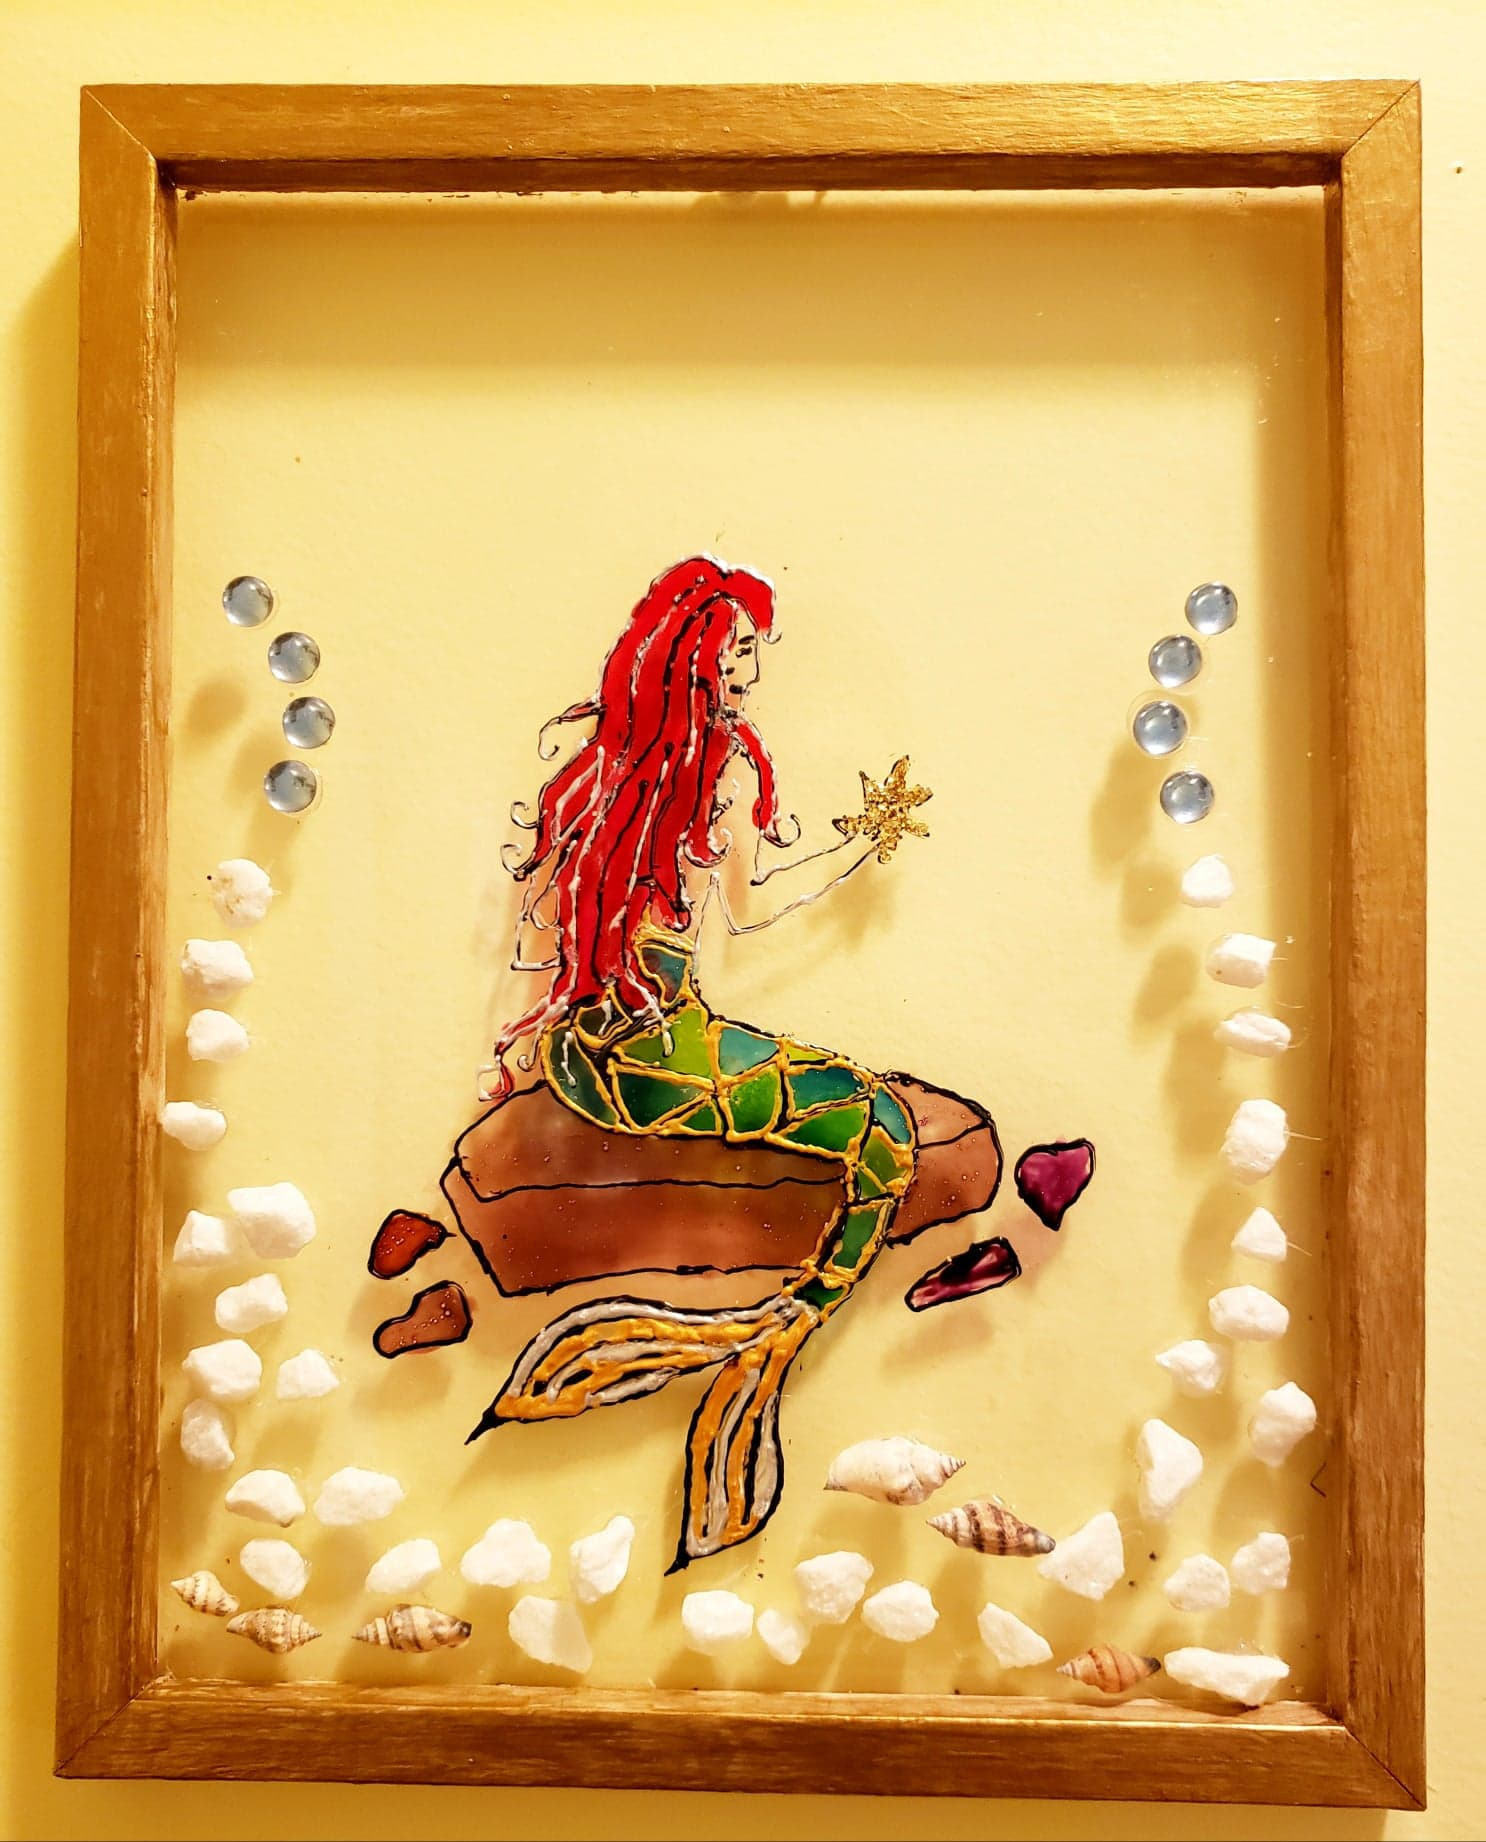 1 - Mermaid 1